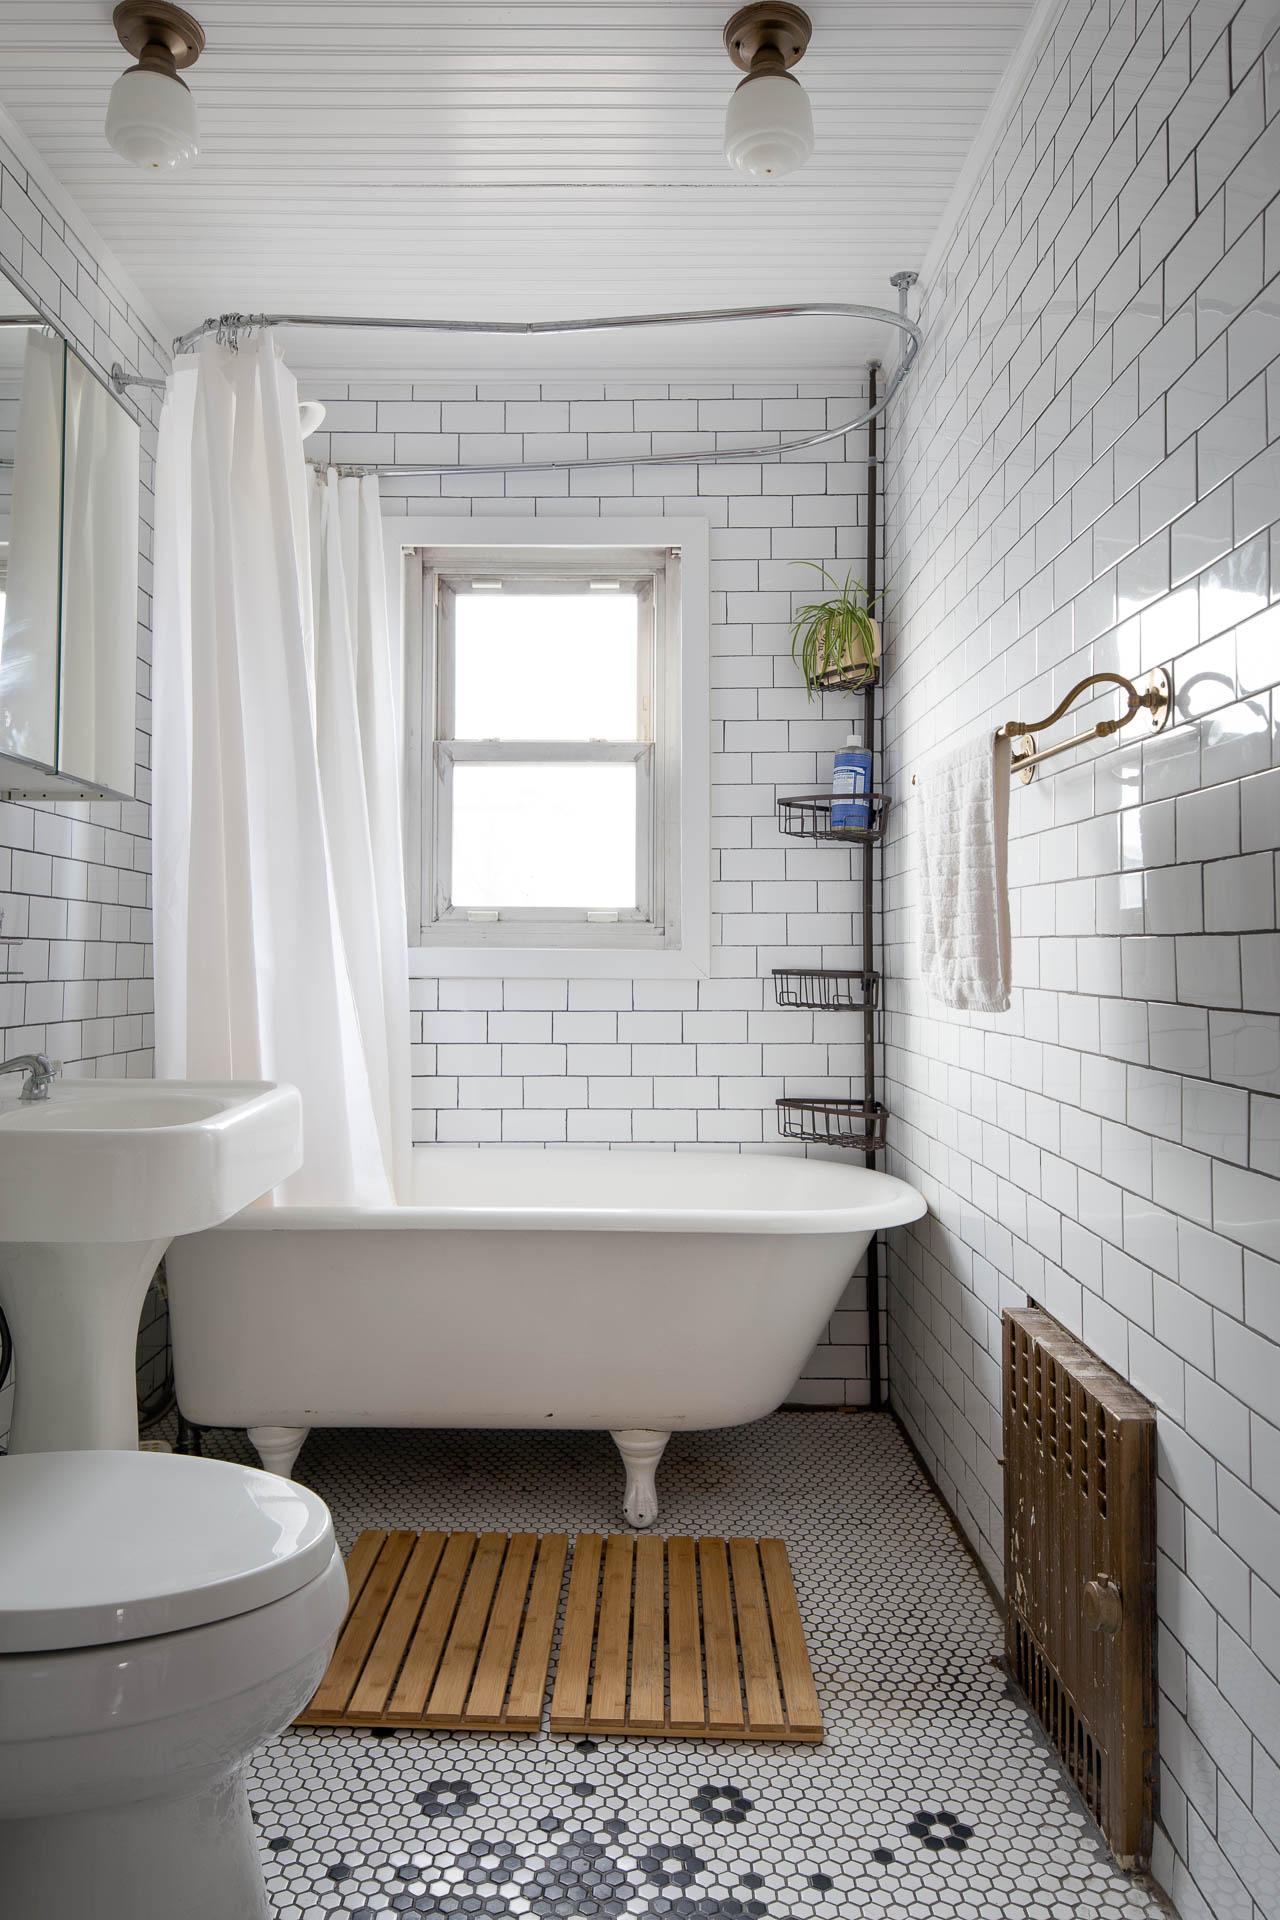 upstairs_bathroom-1.jpg